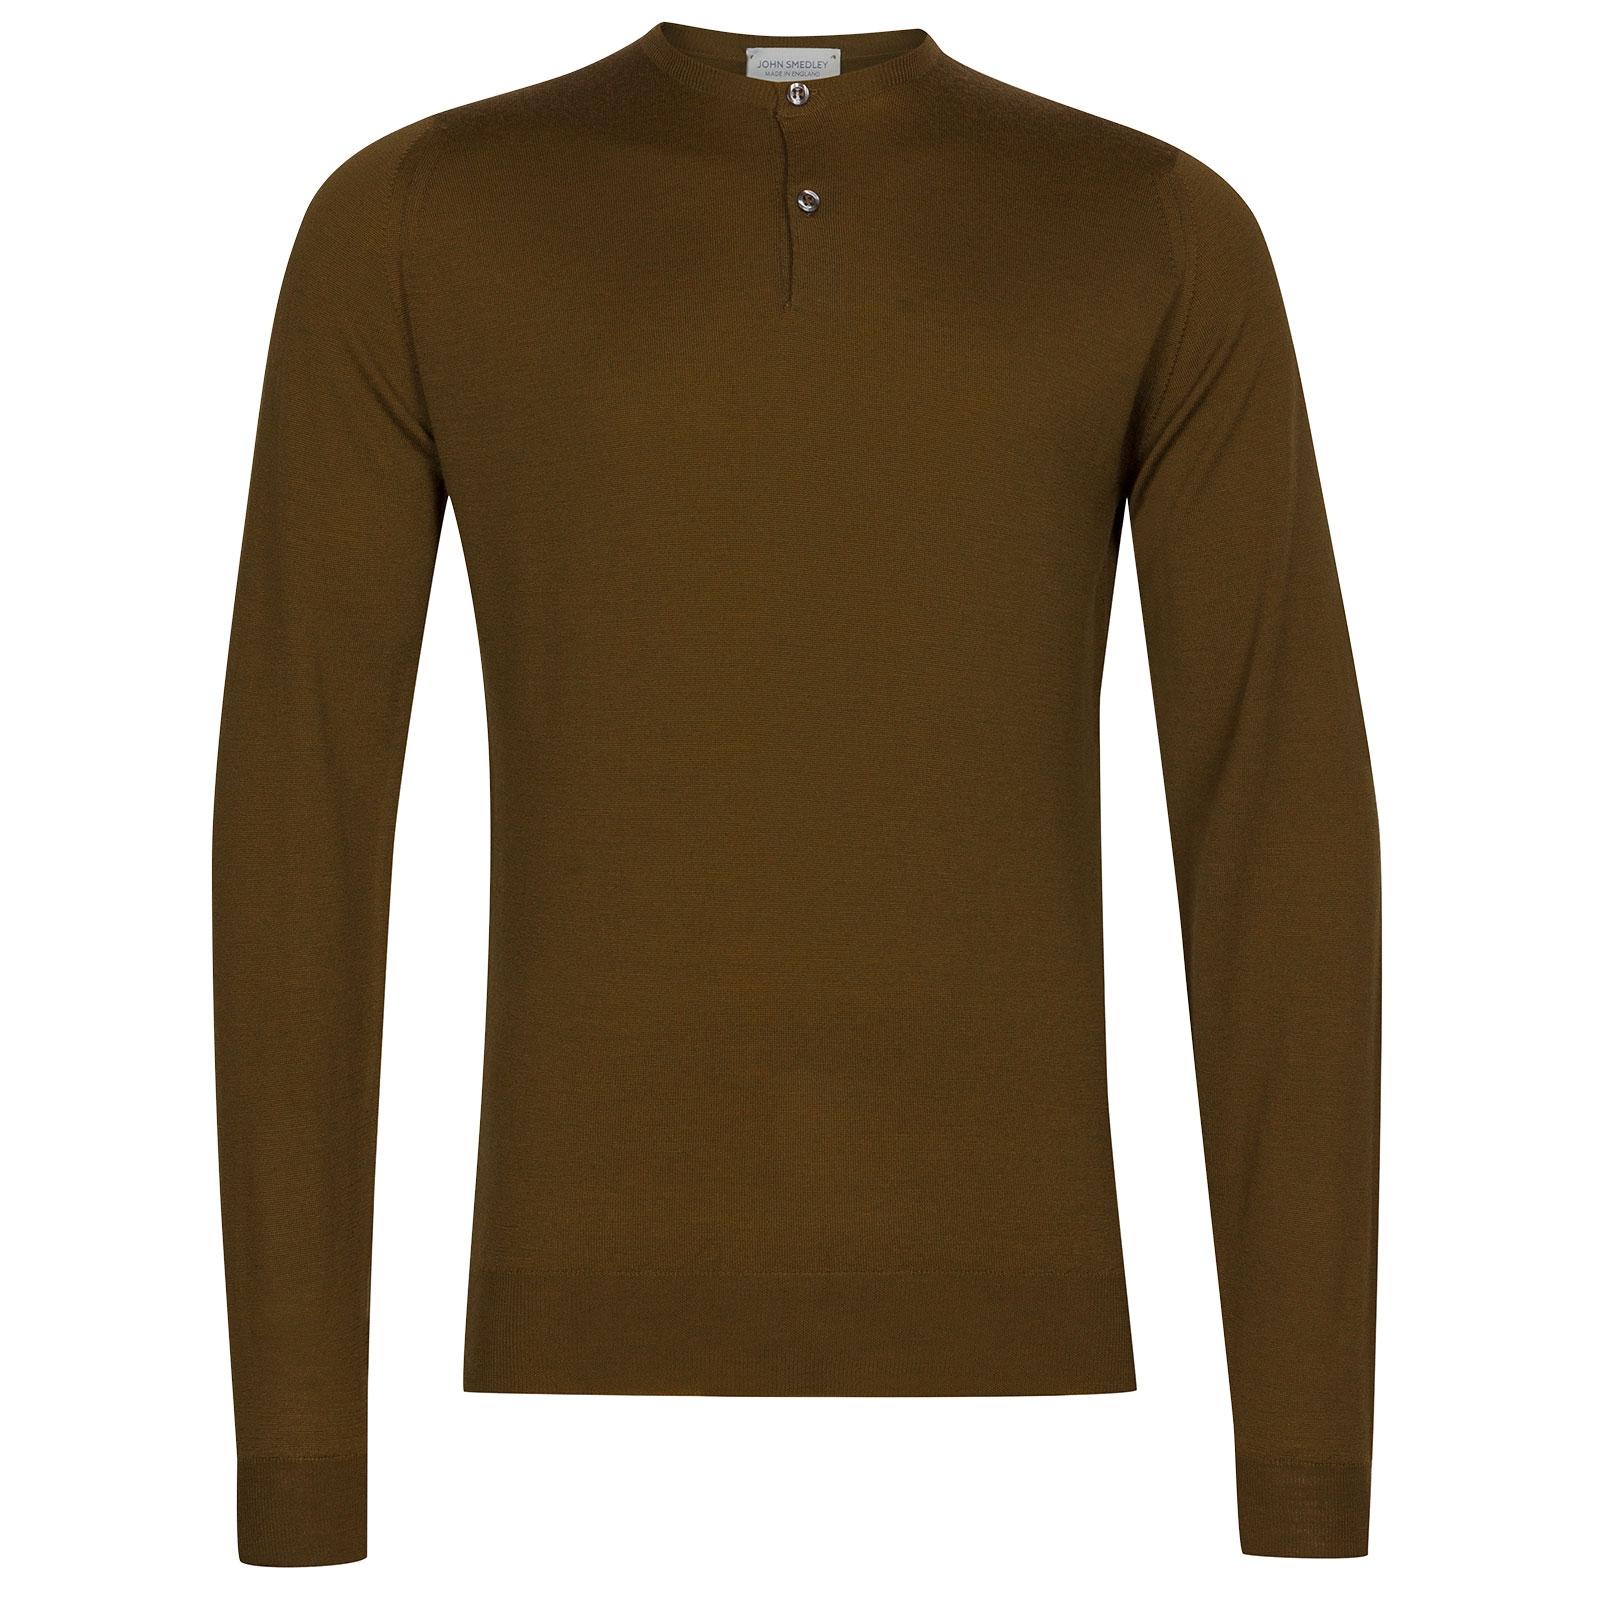 John Smedley Russet Merino Wool Henley Shirt in Khaki-XXL